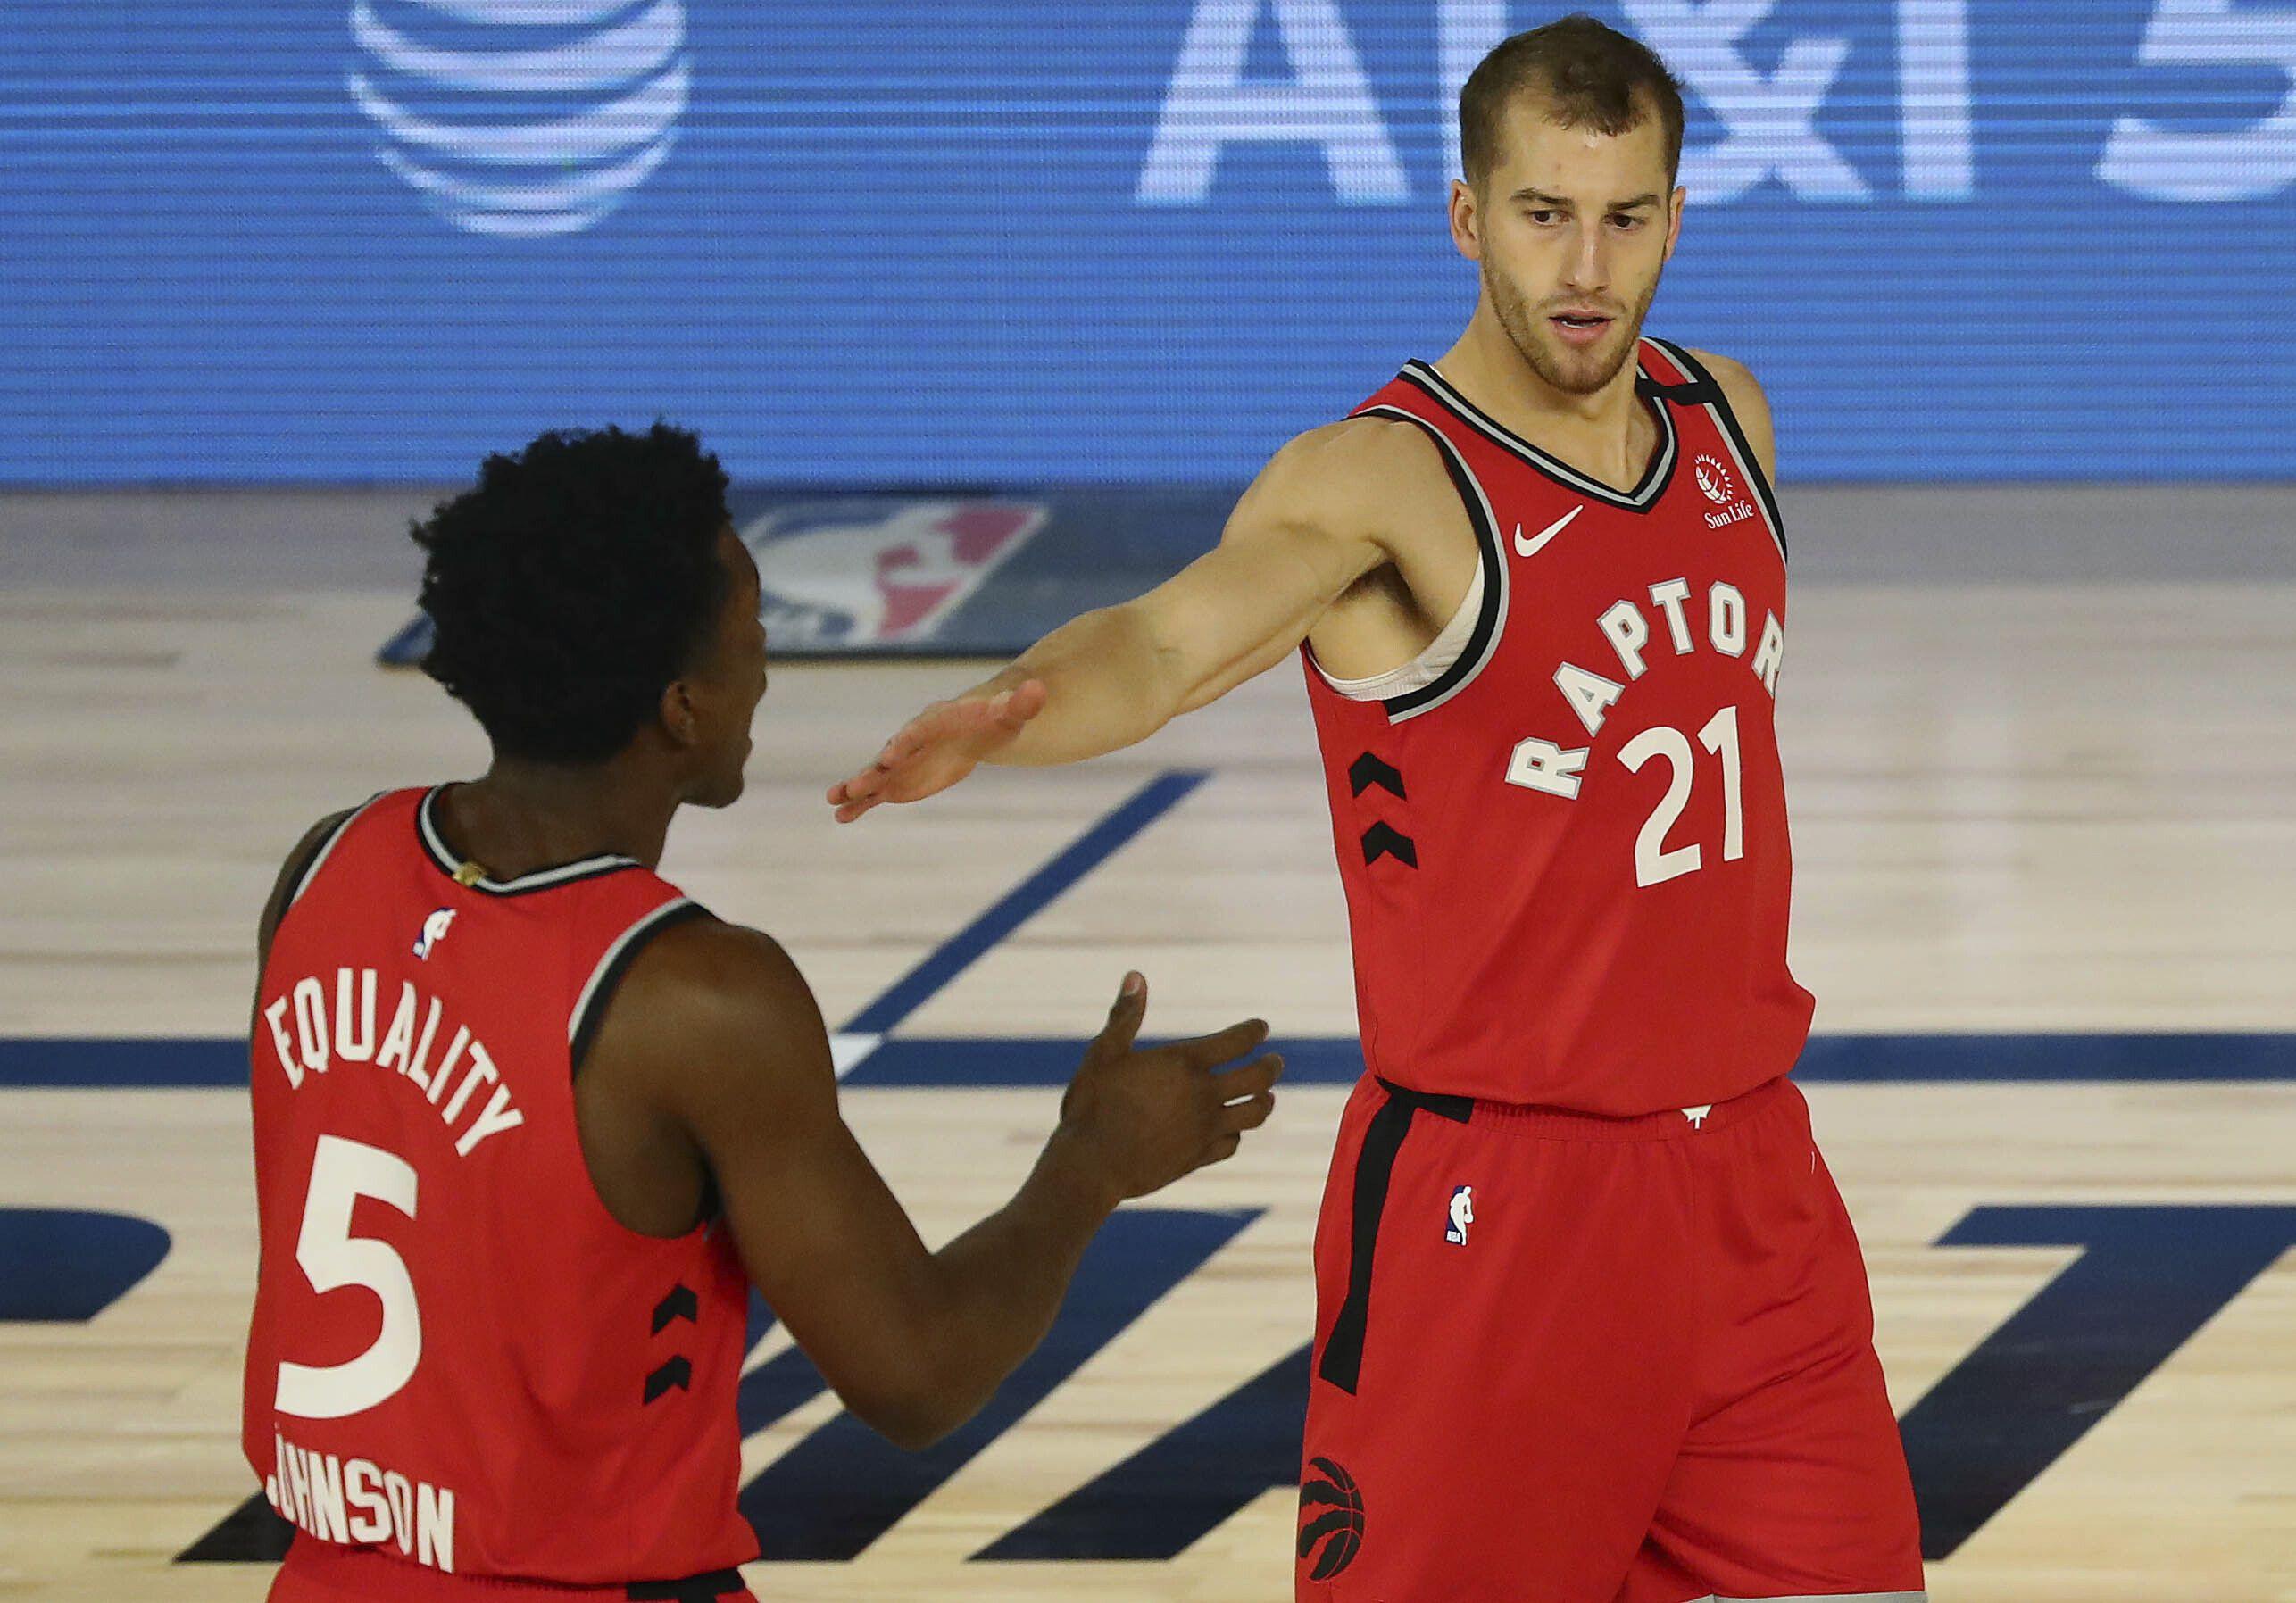 Boston Celtics Vs Toronto Raptors Game 1 Free Live Stream 8 30 20 Watch Nba Playoffs Online Time Tv Channel Nj Com